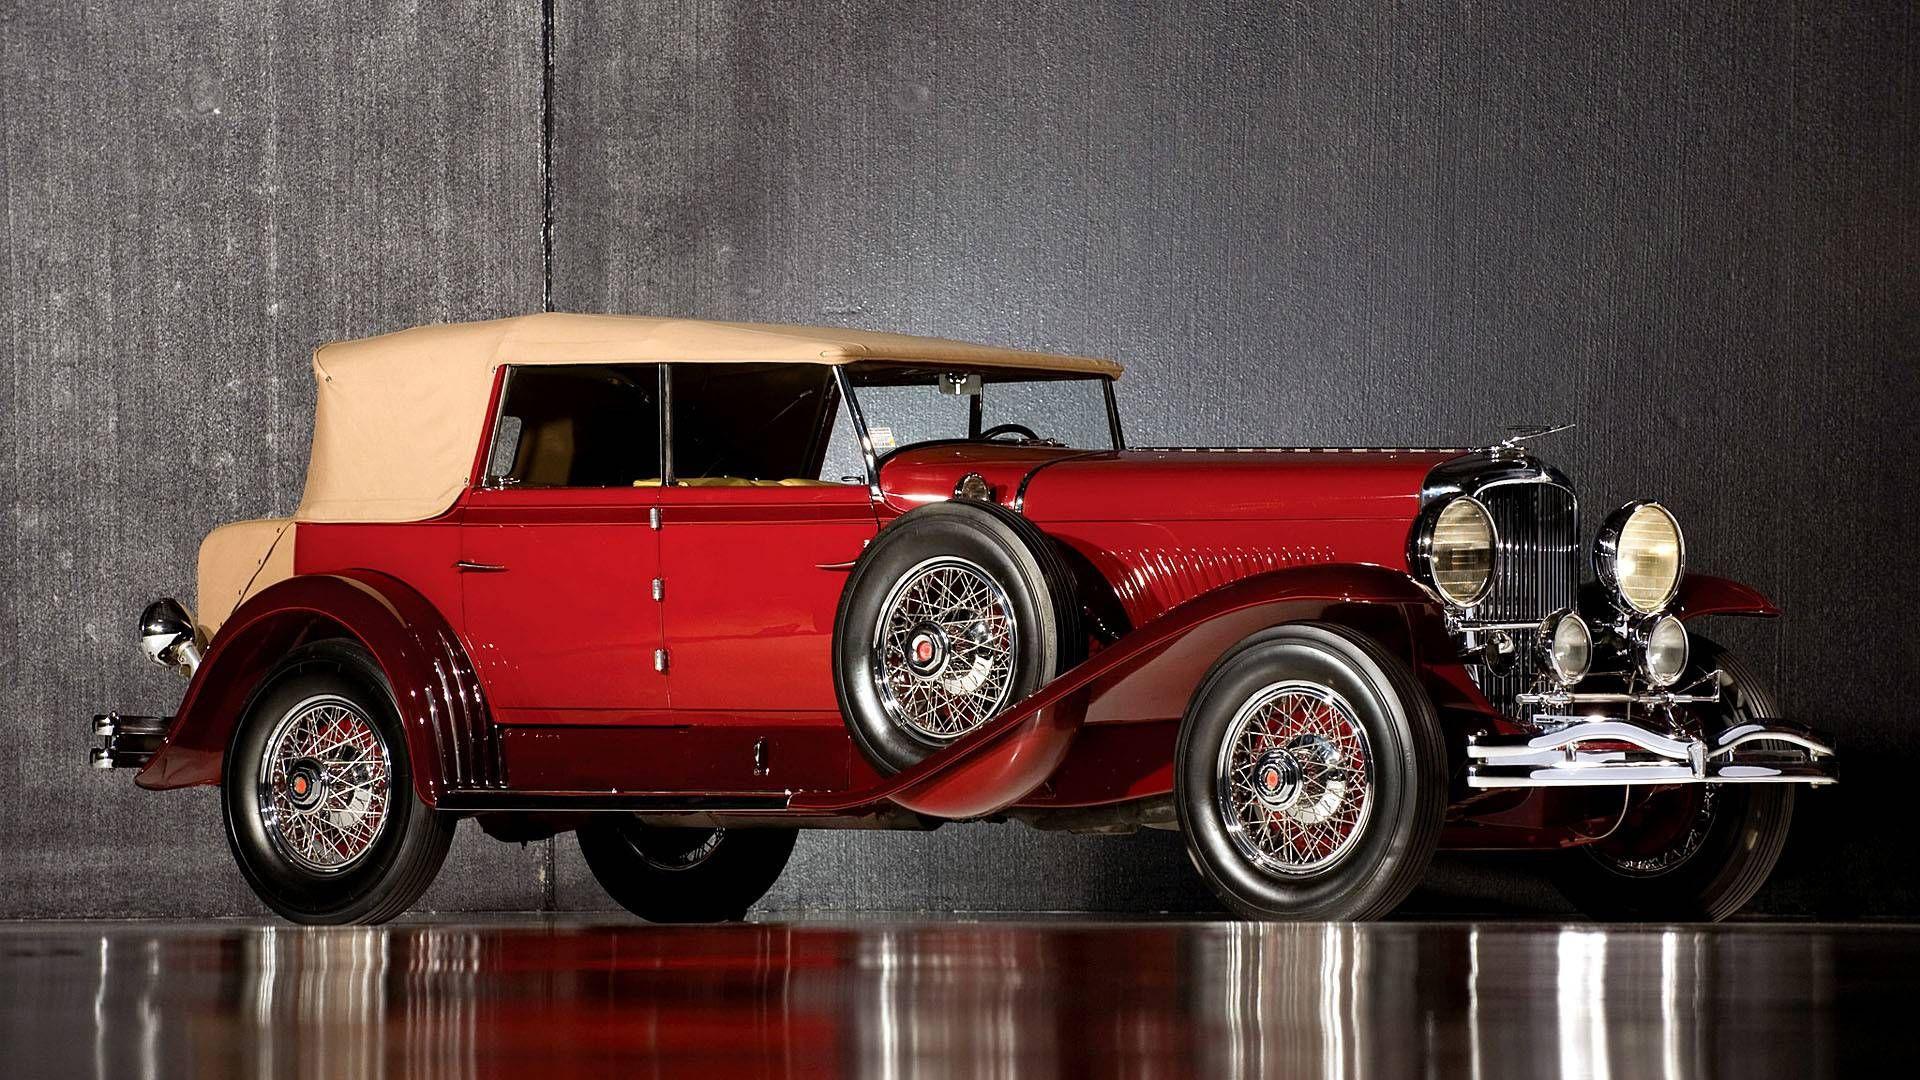 vintage-car-hd-desktop-wallpapers-free-old-car-images.jpg (1920×1080 ...